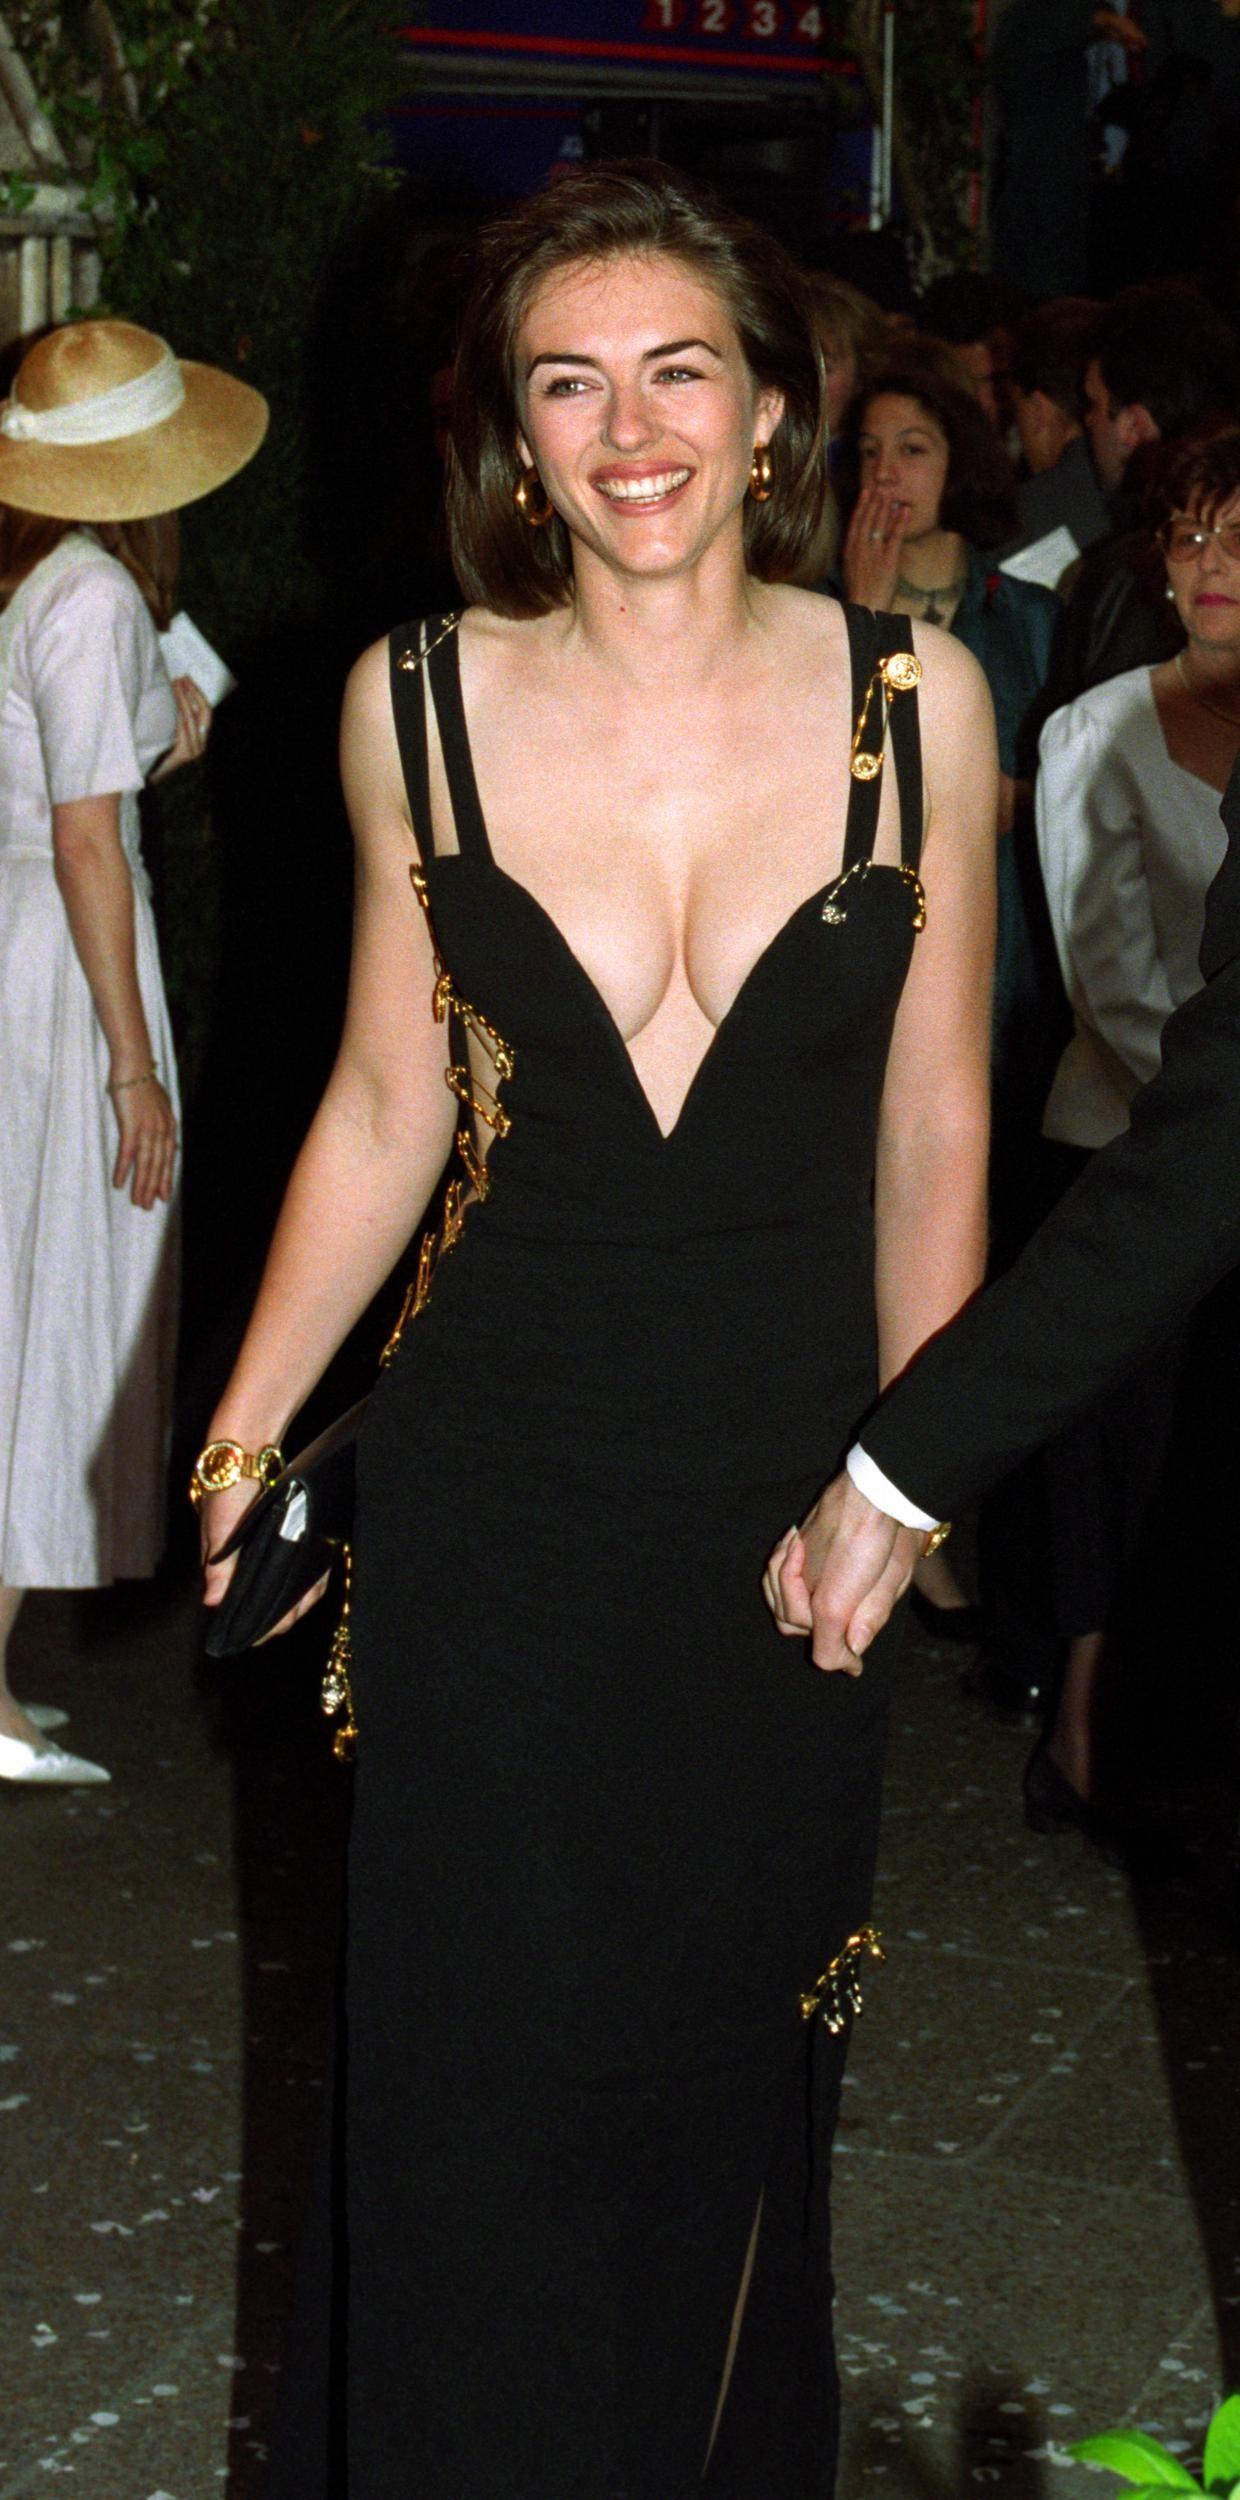 Elizabeth Hurley Hurley Dress Liz Hurley Dress Elizabeth Hurley